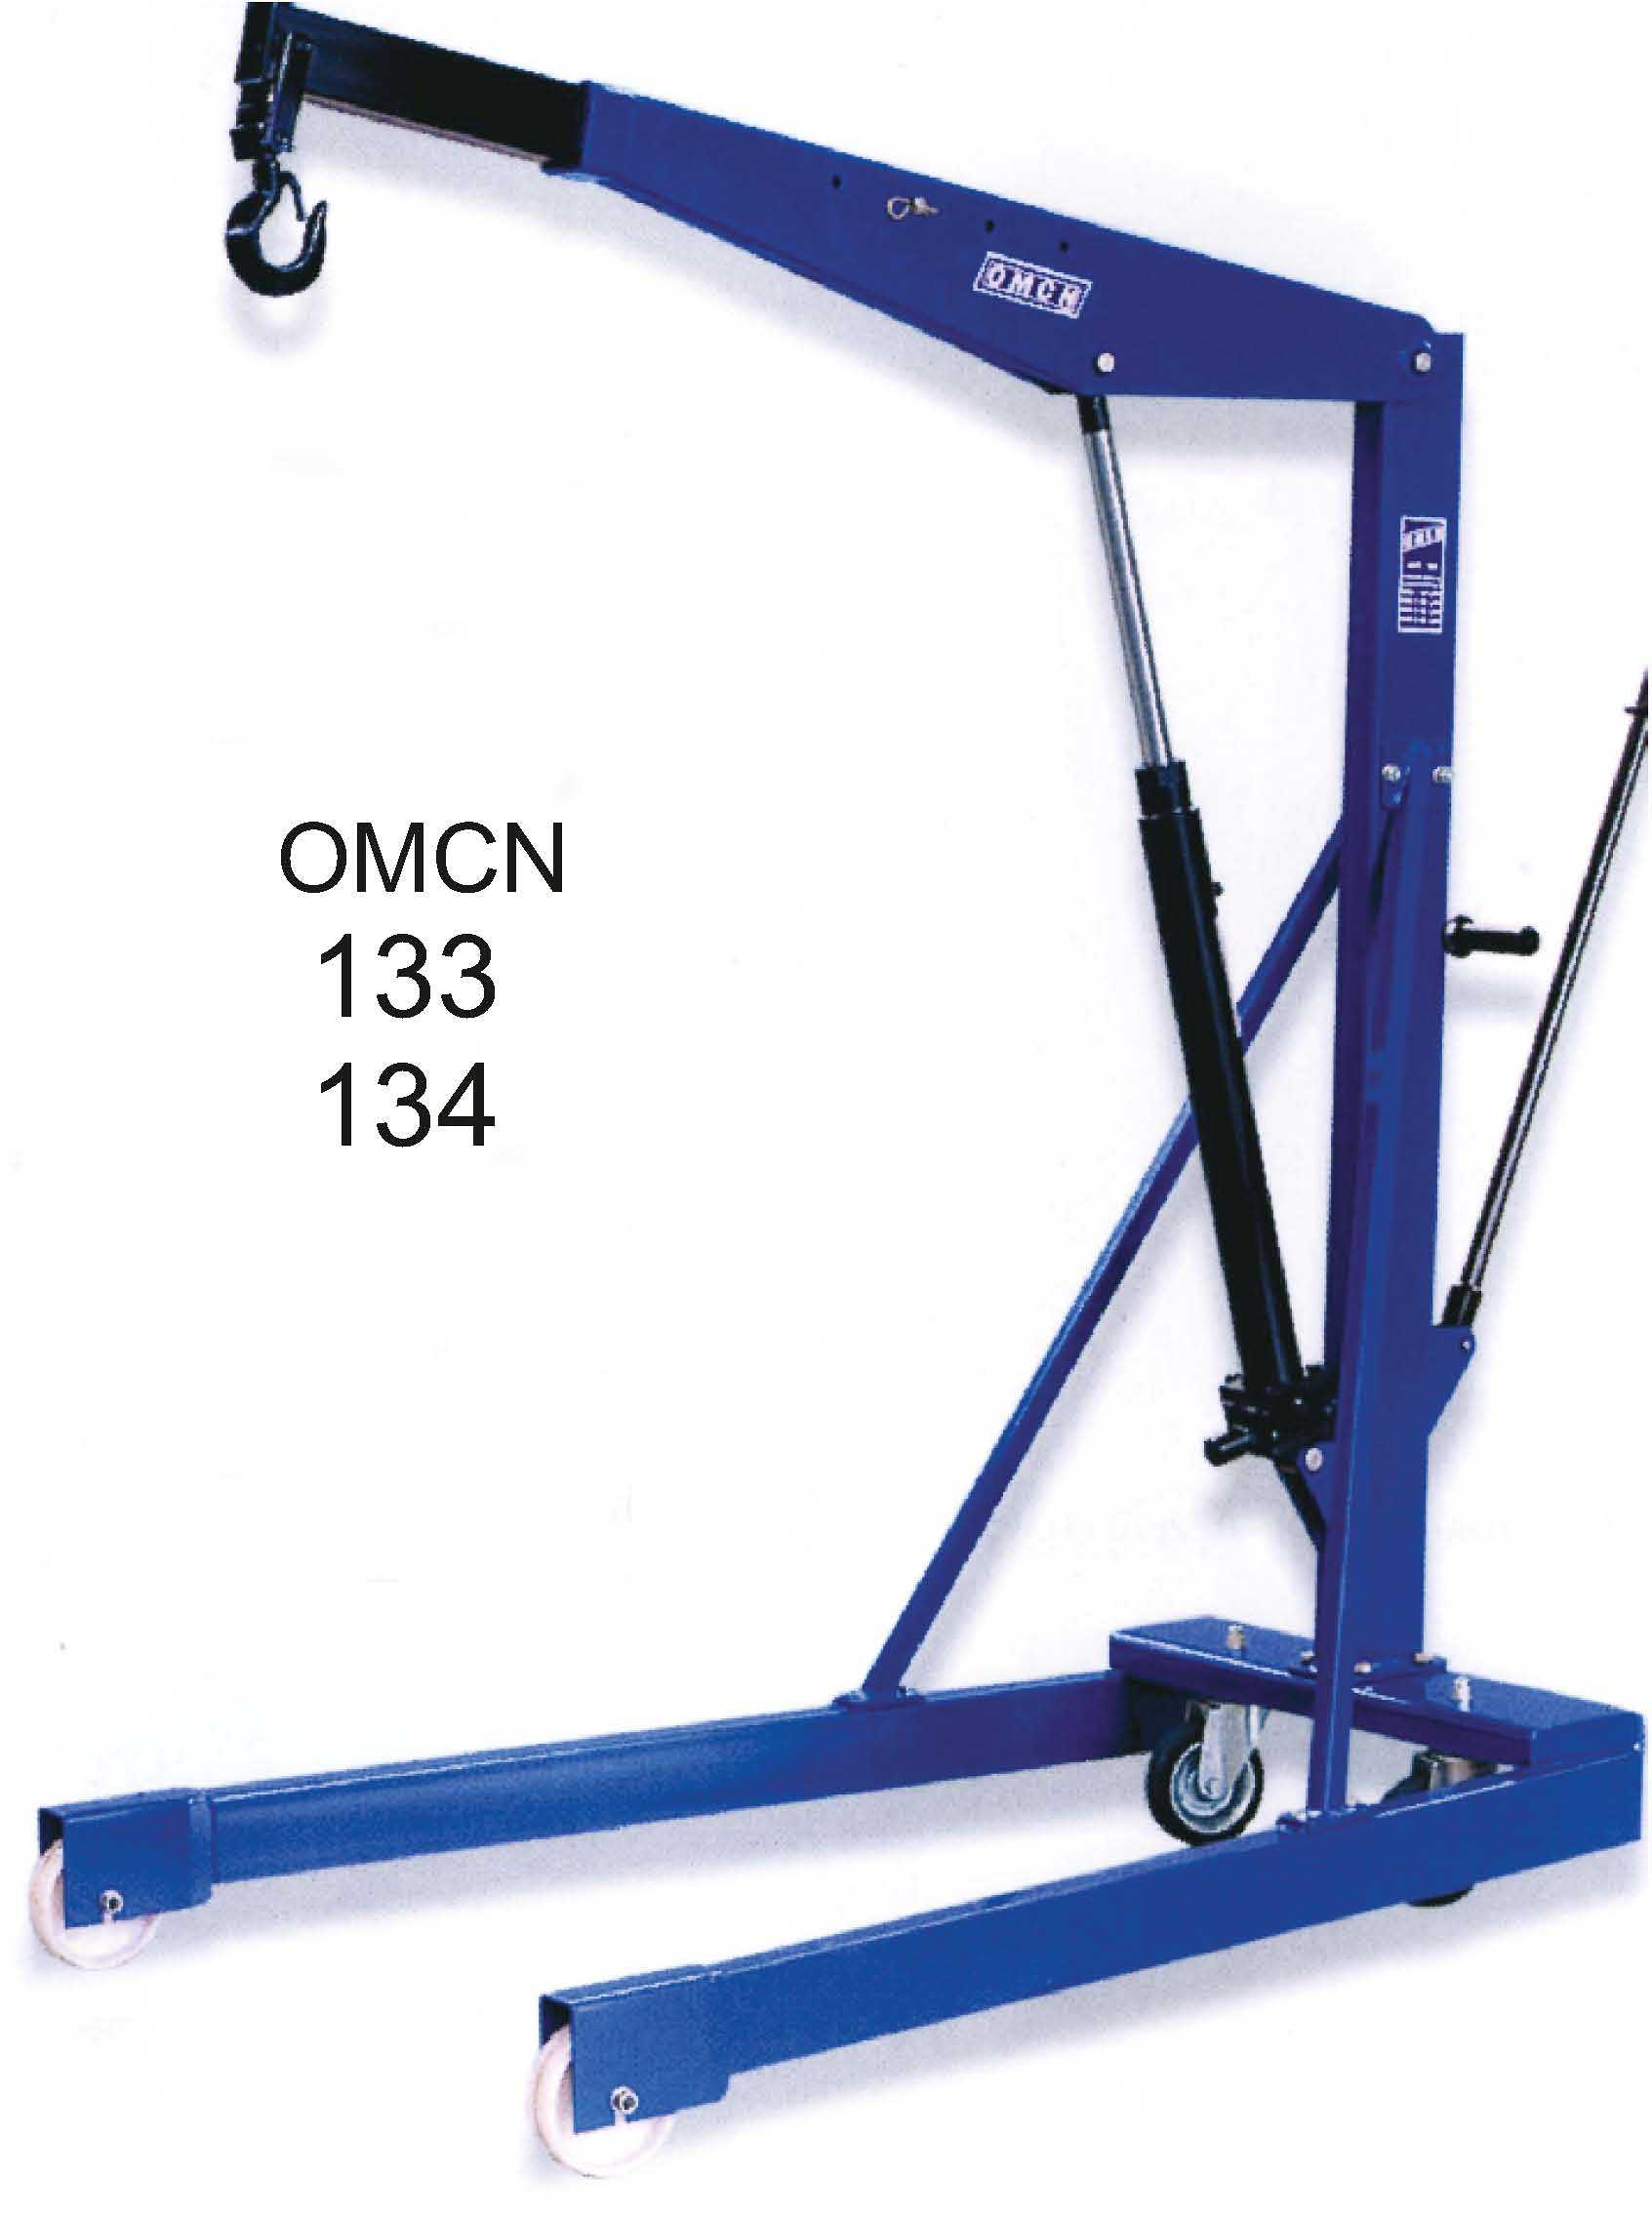 OMCN 133